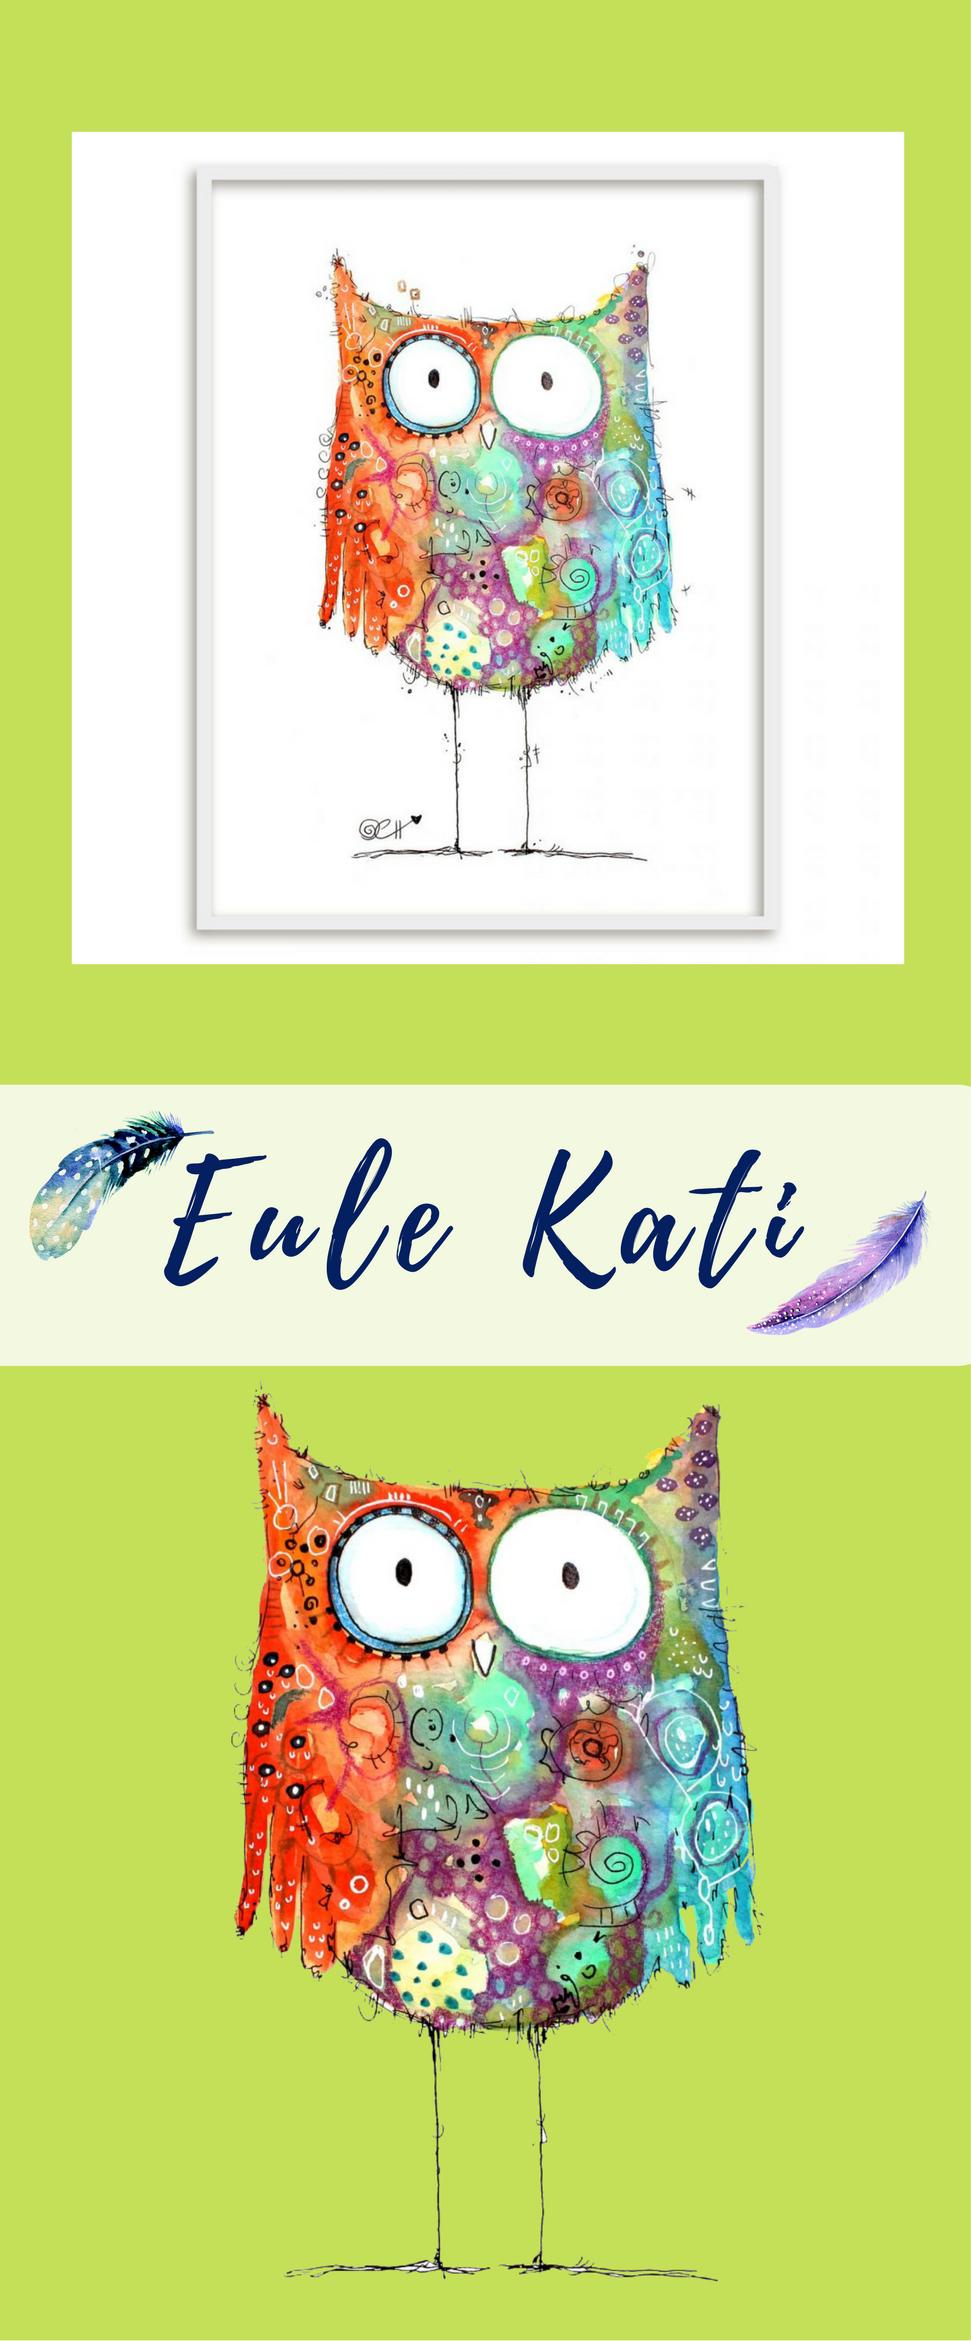 Poster Hagenmeyer - Eule Kati | Eulen kinderzimmer, Kunst poster und ...